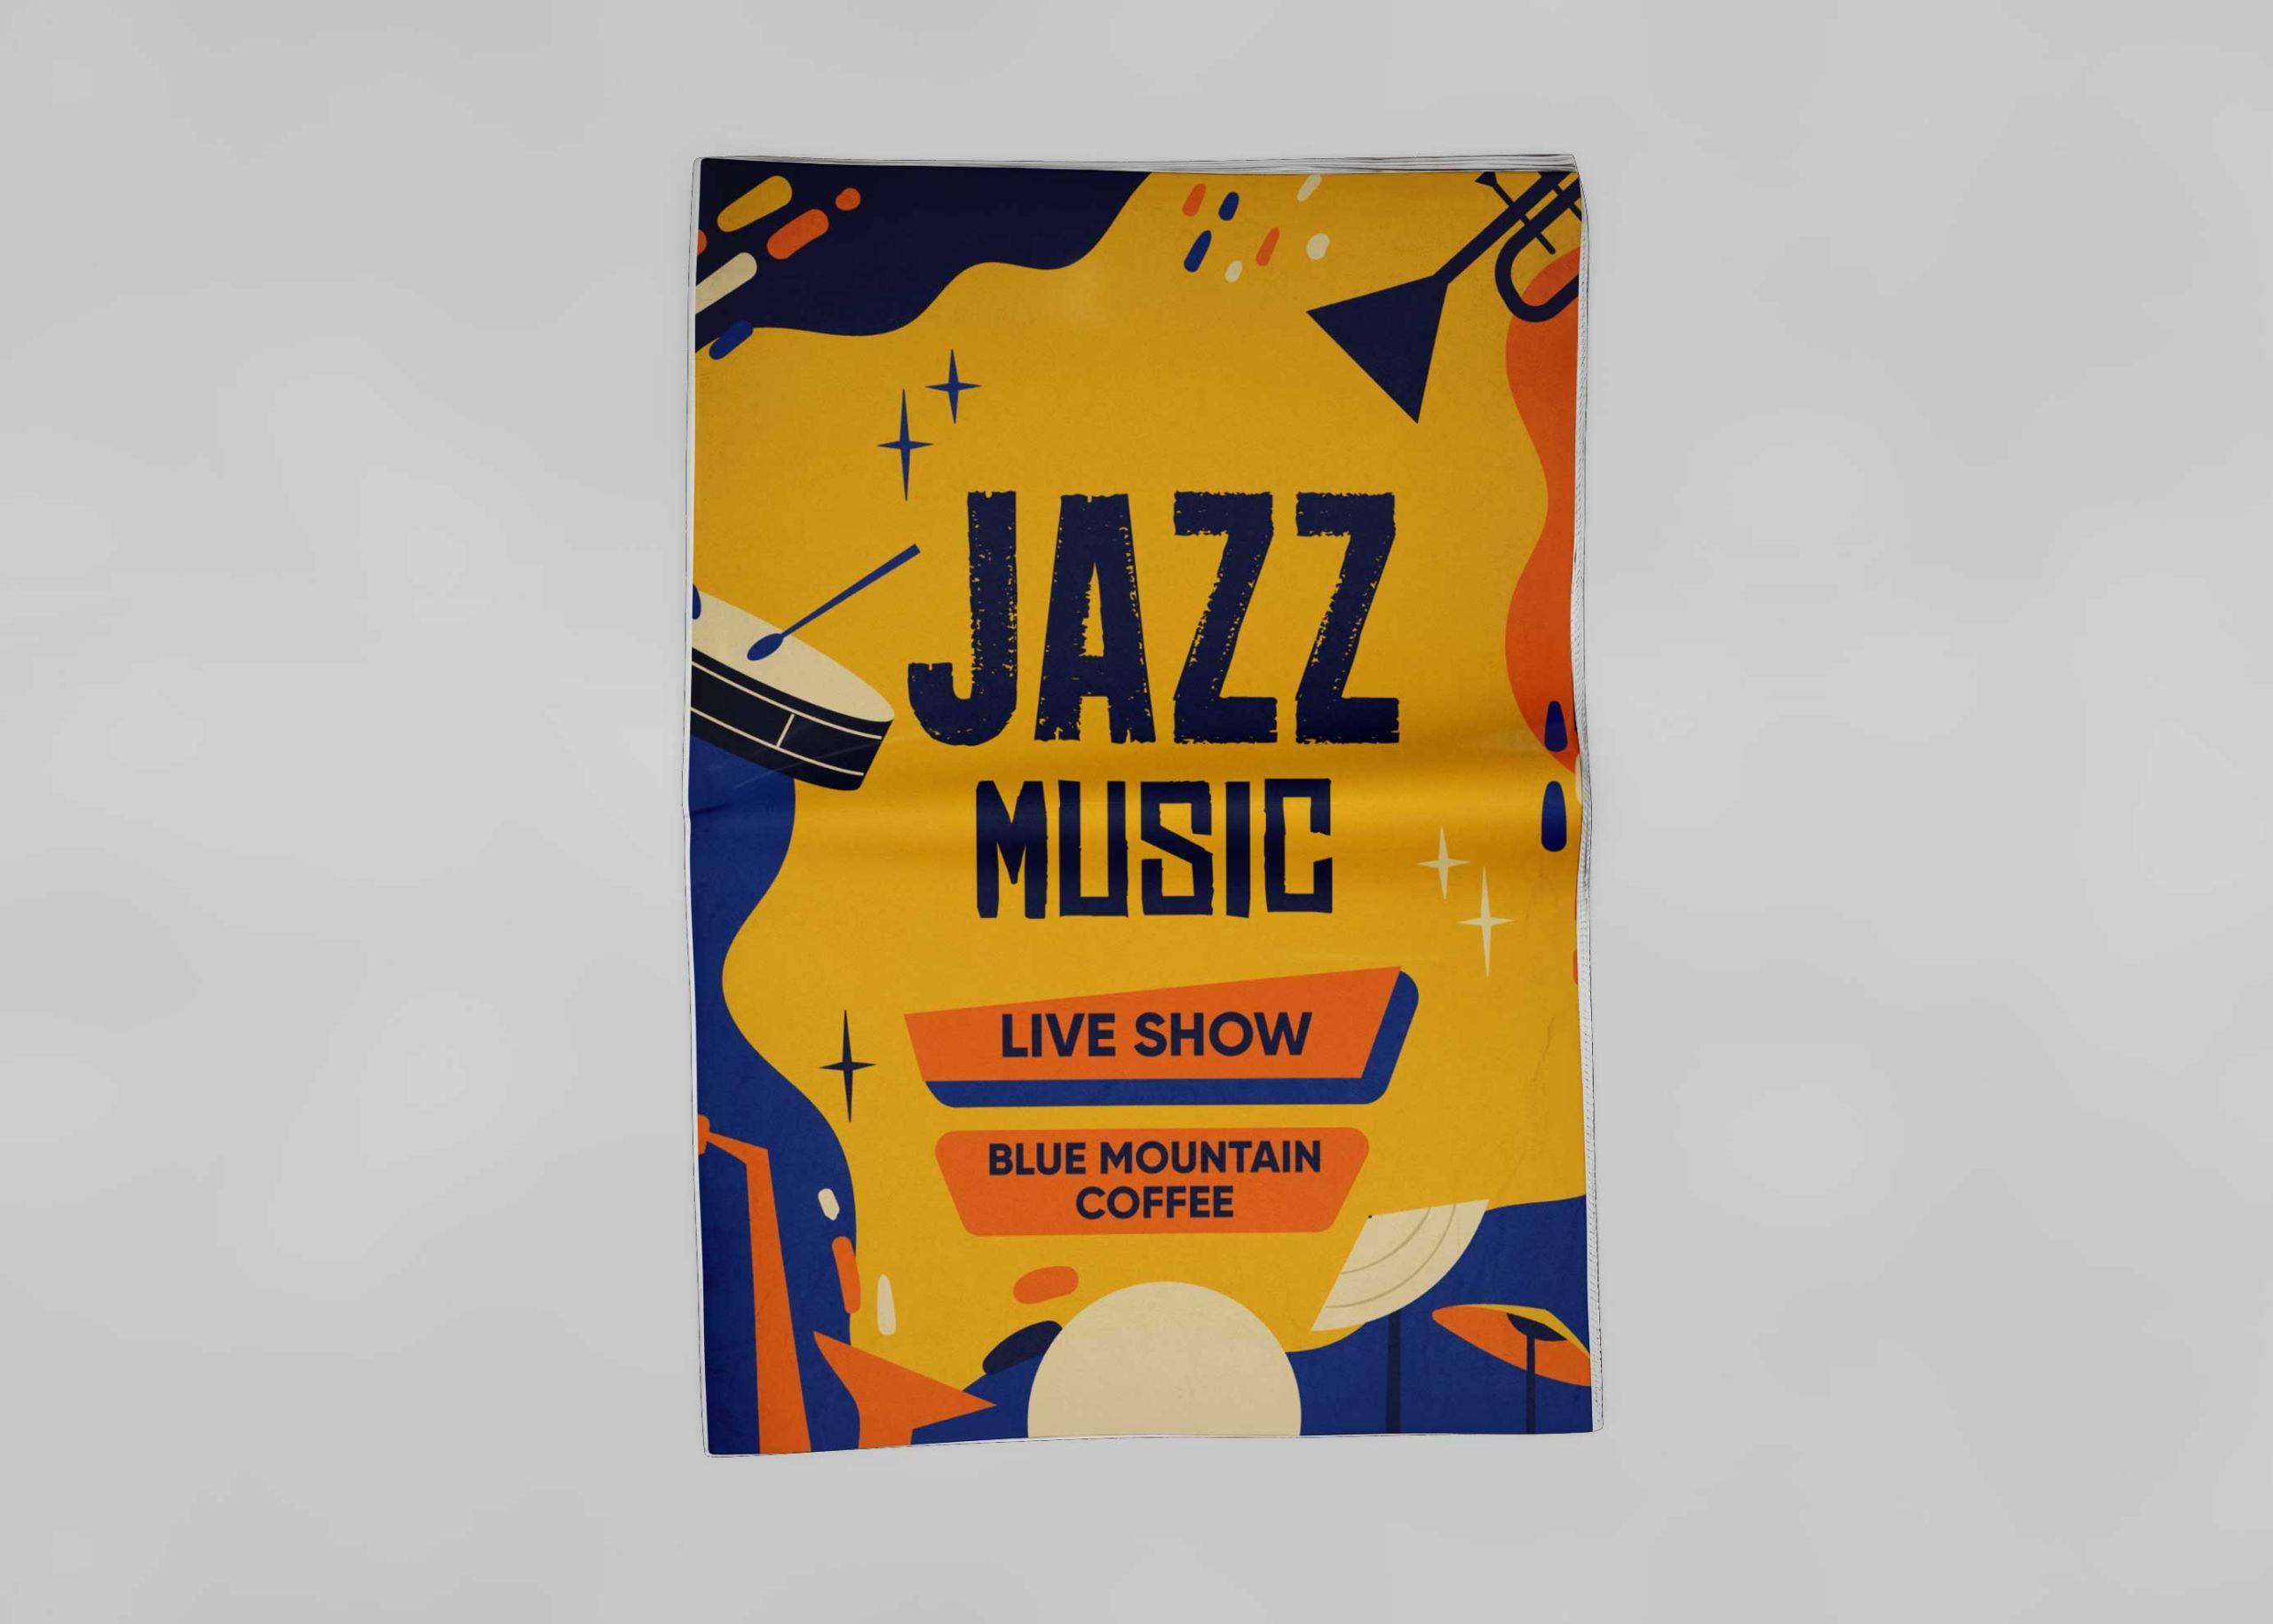 Jazz Music Flyer Free PSD Mockup in 2020 Flyer mockup